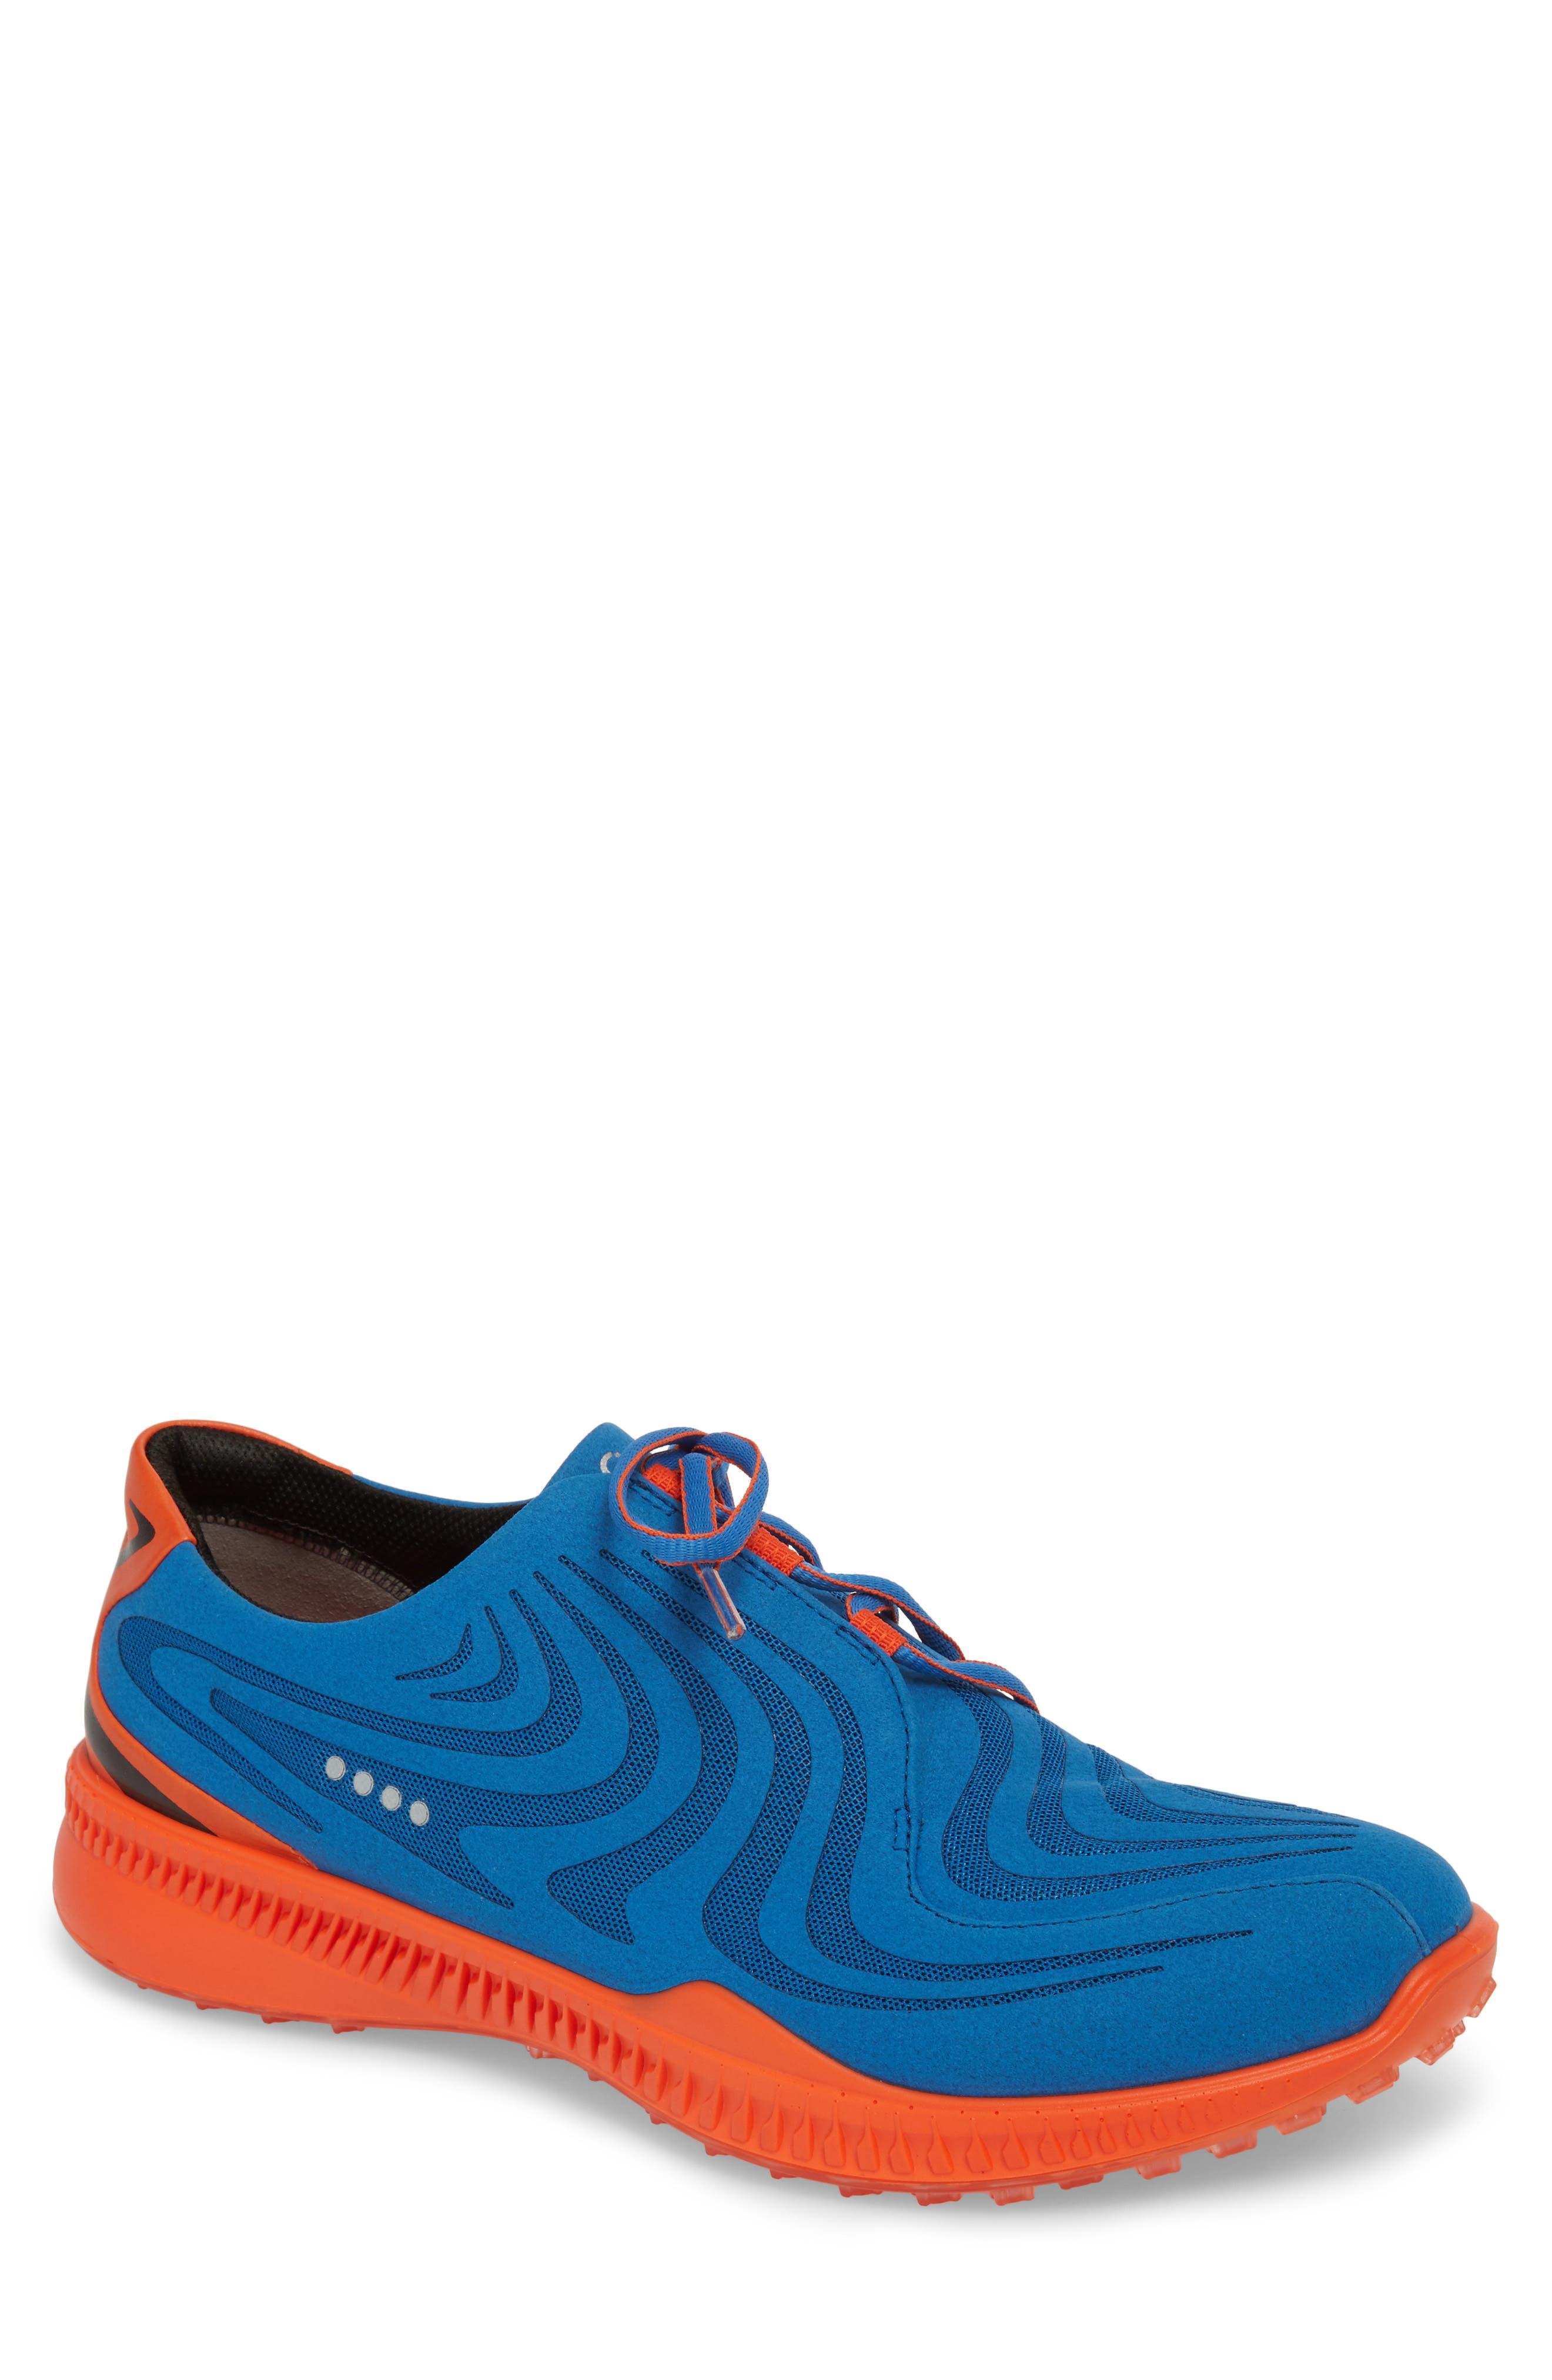 Main Image - ECCO Golf S-Drive Water Resistant Shoe (Men)